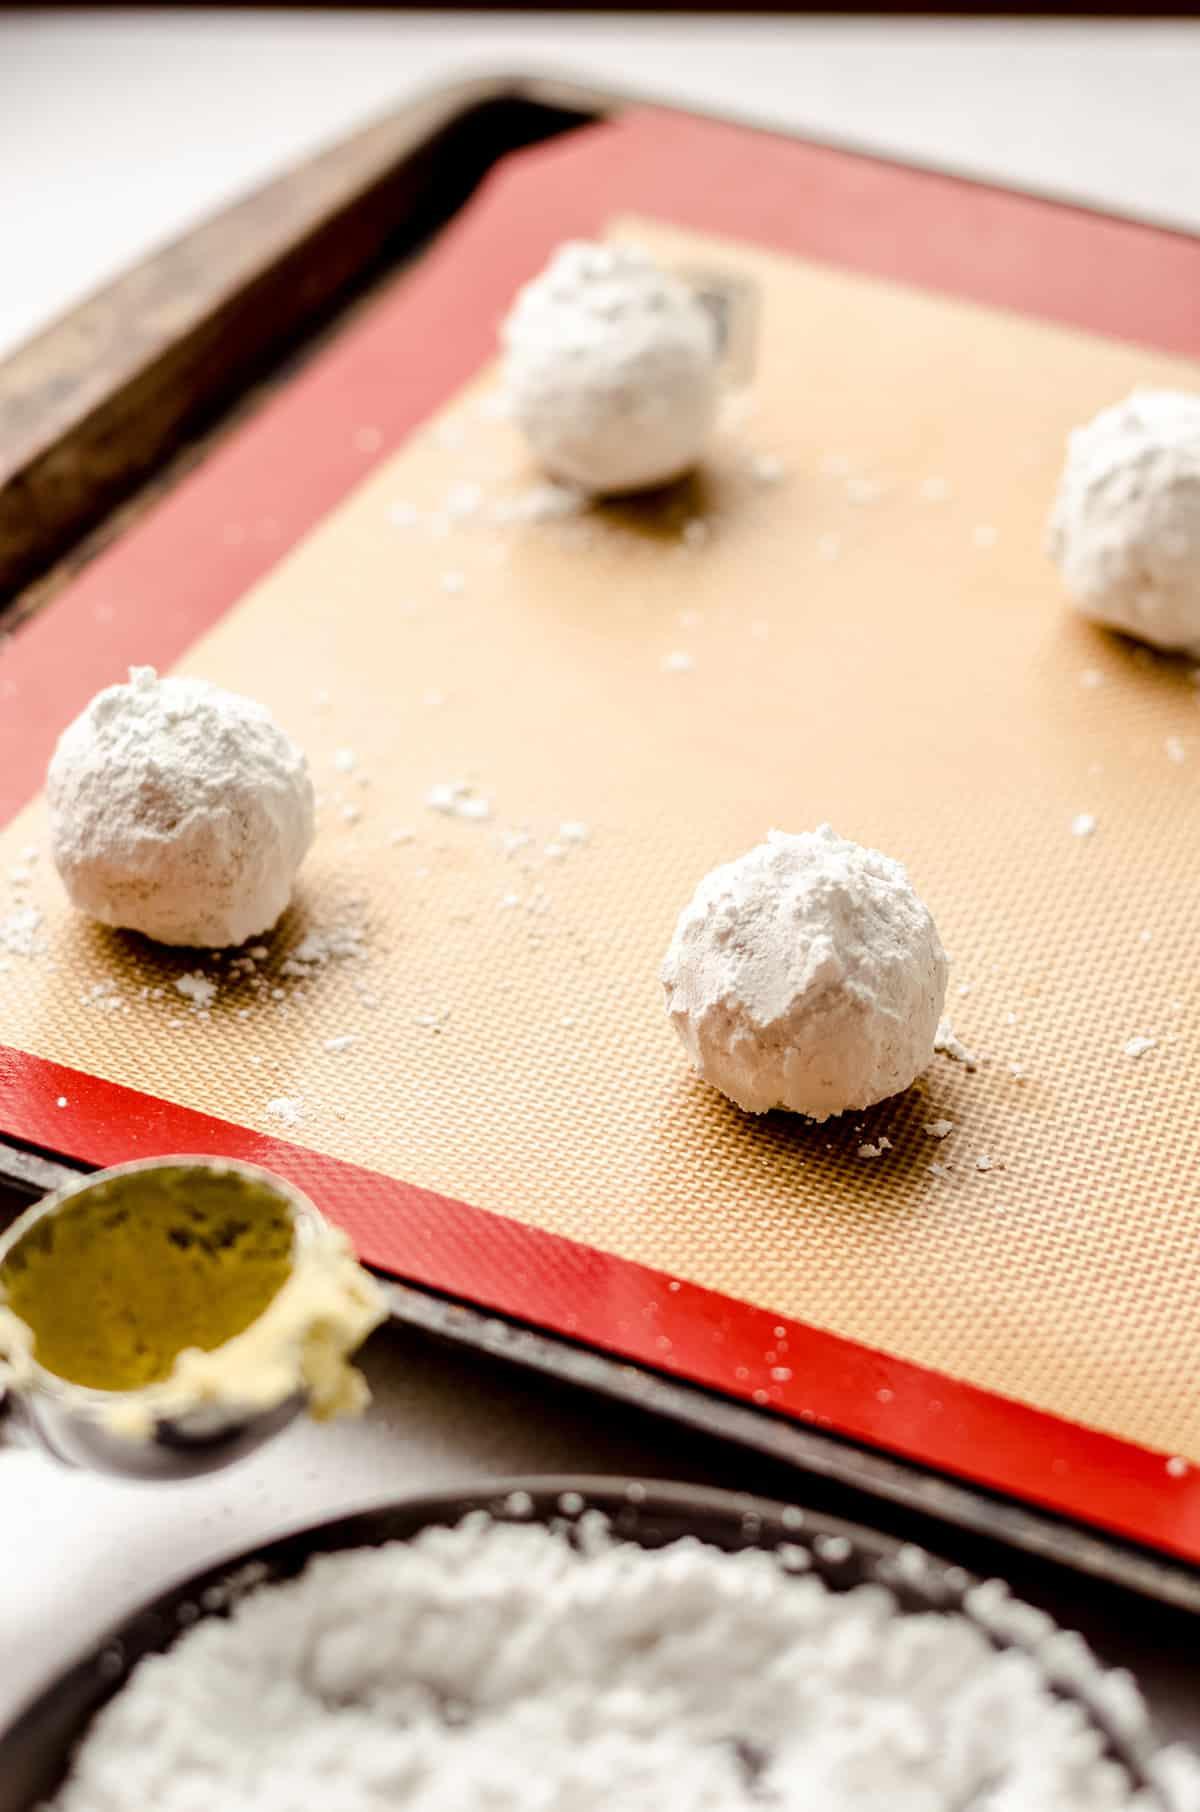 lemon crinkle cookie dough balls coated in powdered sugar on a baking sheet